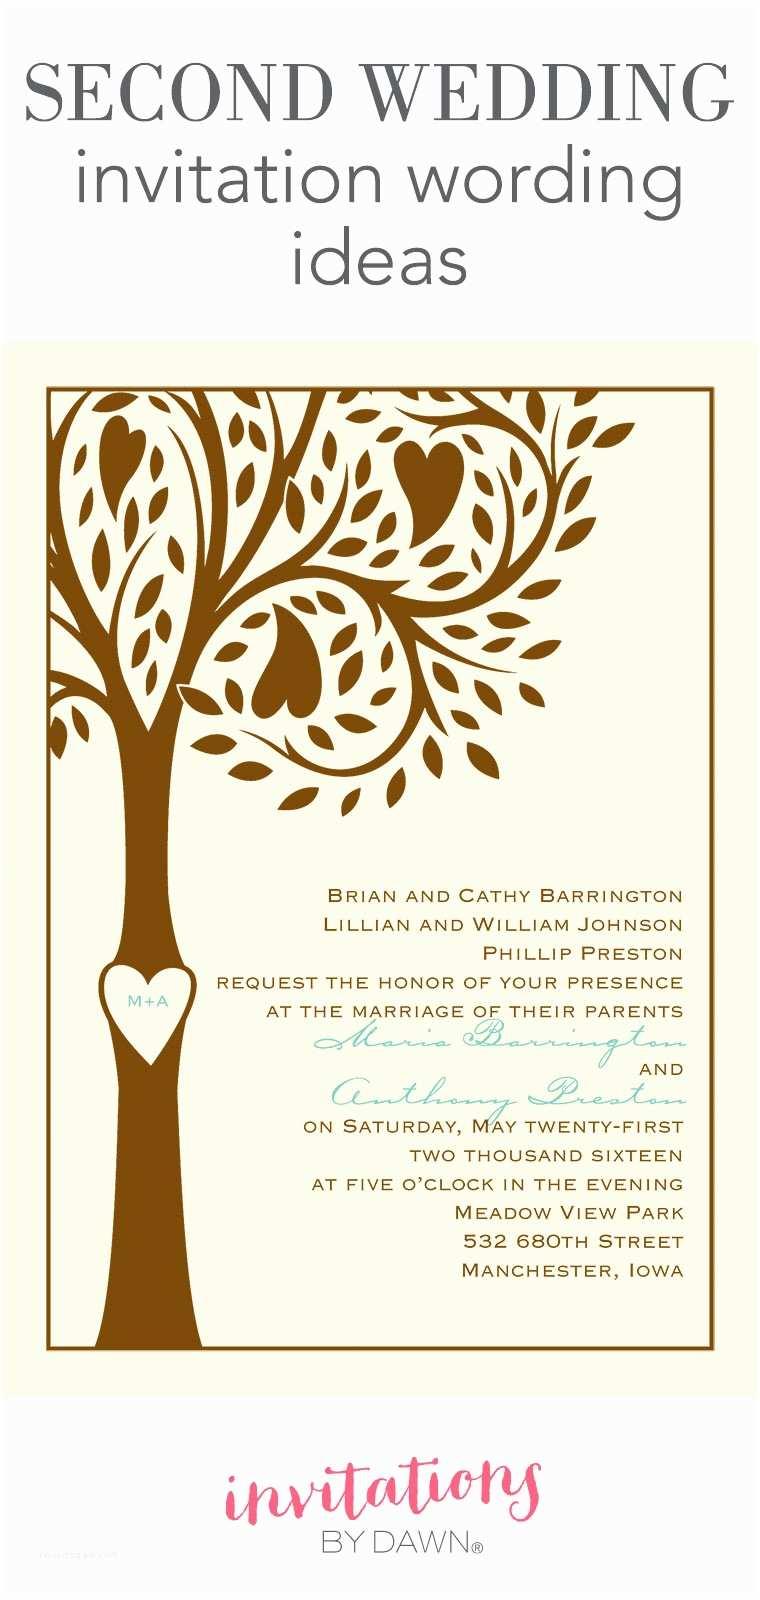 Make Your Own Wedding Invitations Ideas Second Wedding Invitation Wording